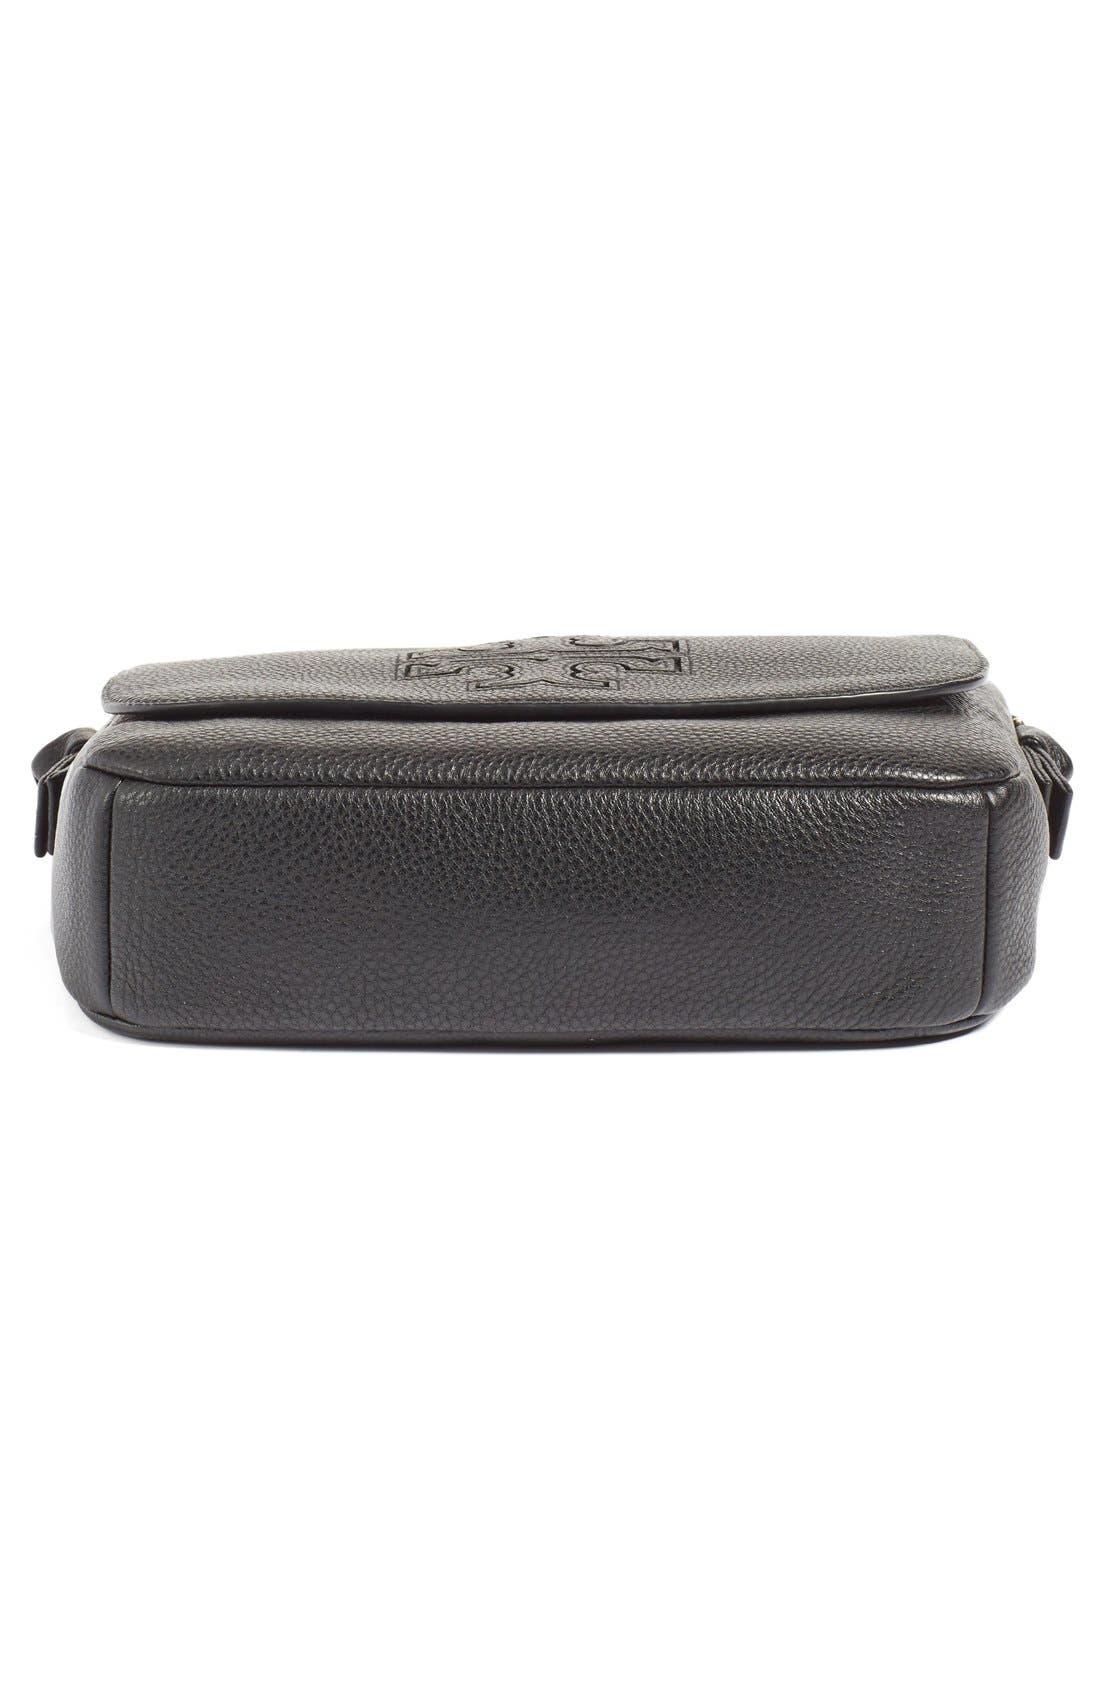 'Harper' Leather Crossbody Bag,                             Alternate thumbnail 6, color,                             012